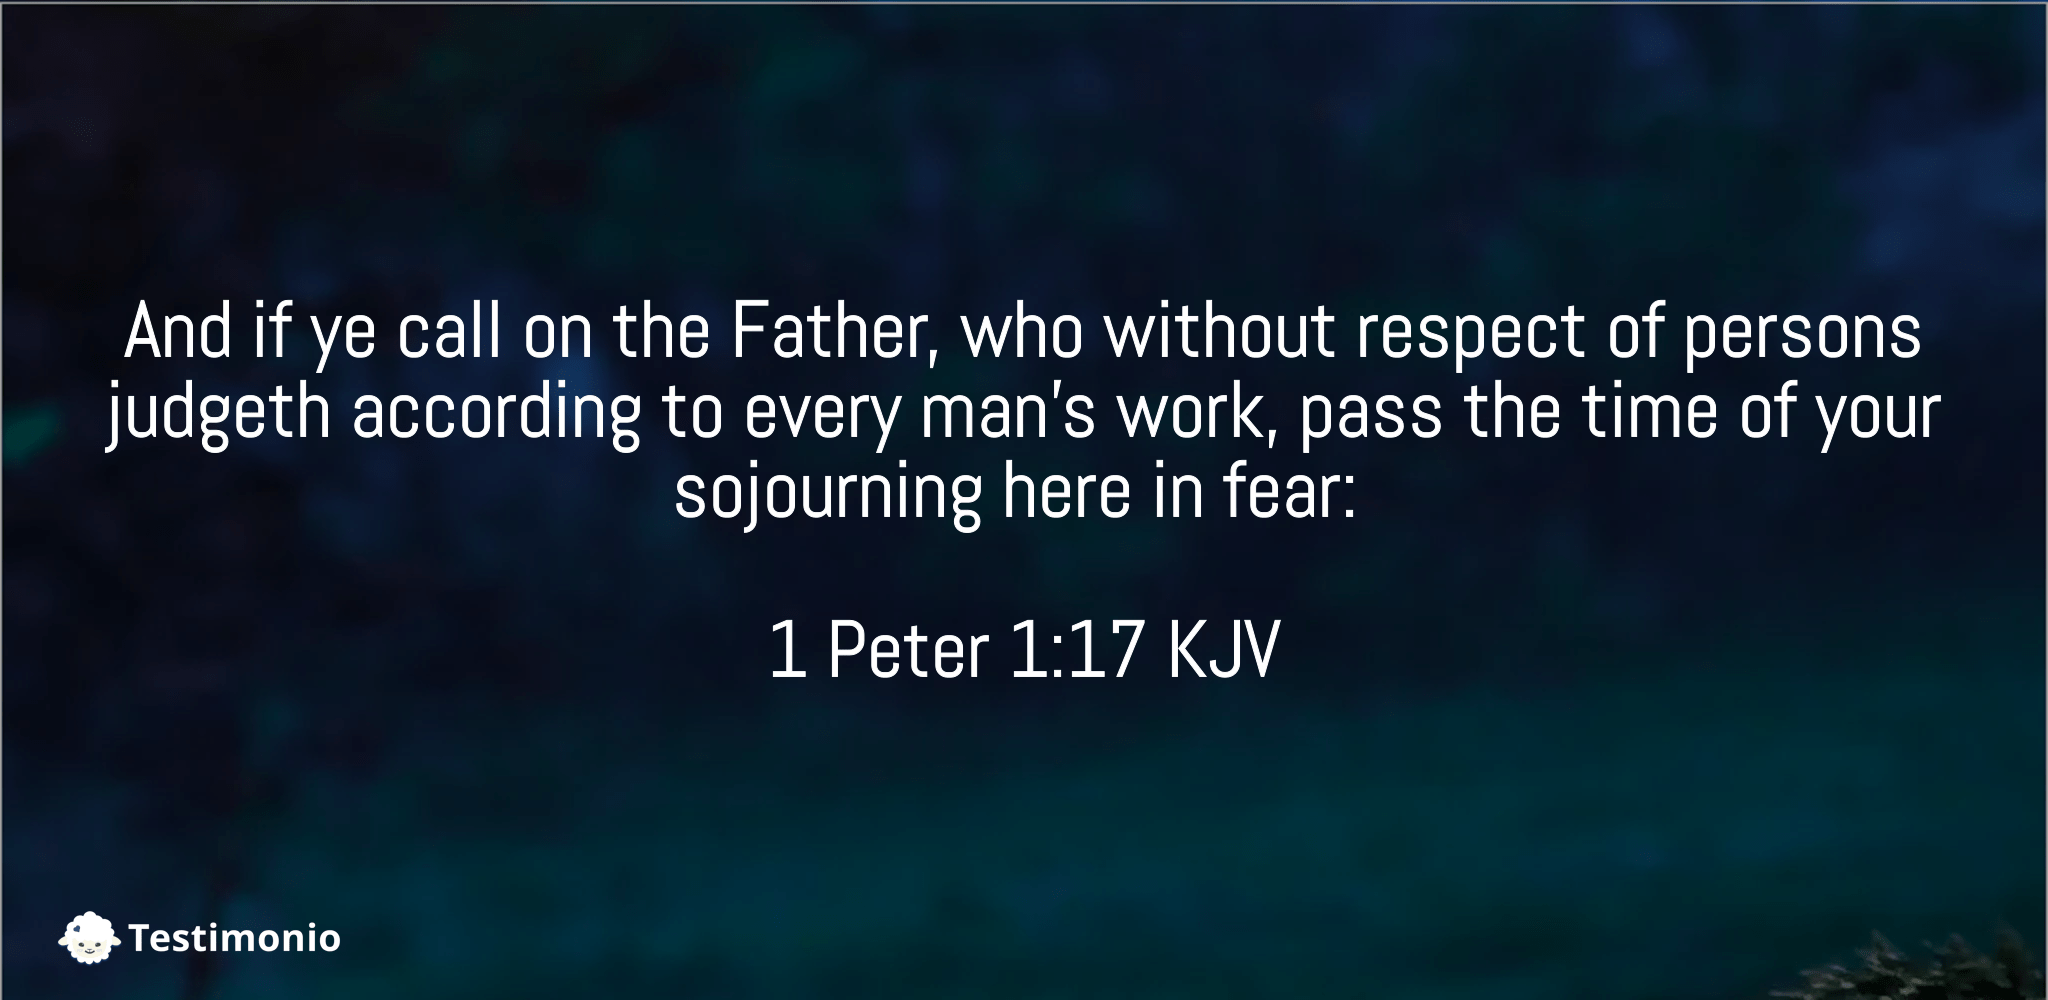 1 Peter 1:17